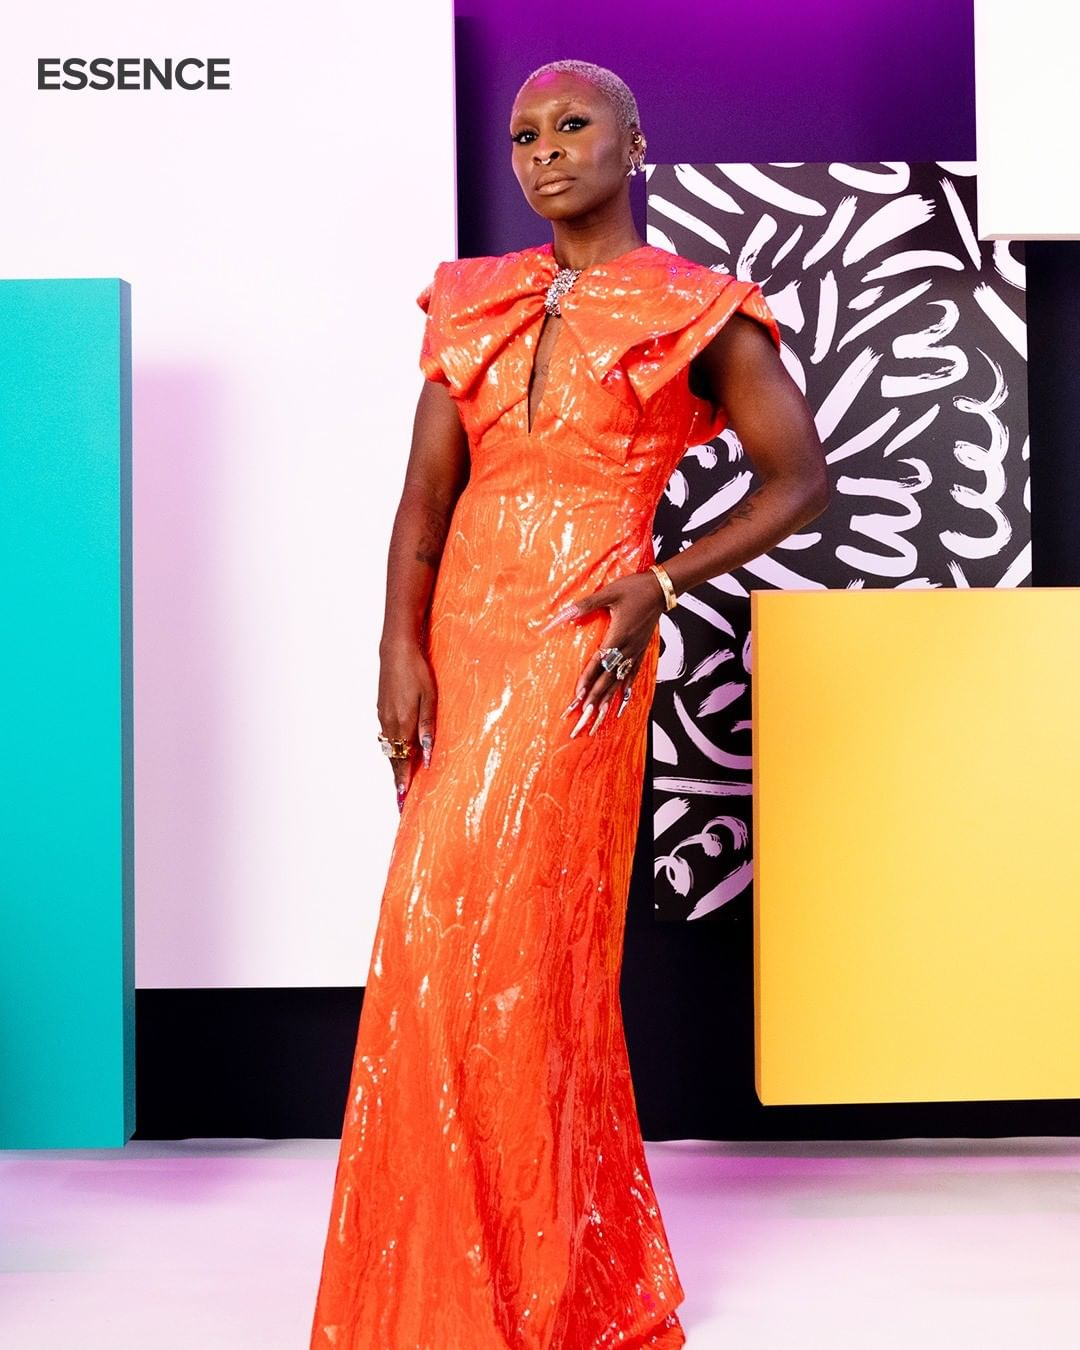 cynthia-erivo-wore-gucci-the-essence-black-women-in-hollywood-awards-2021